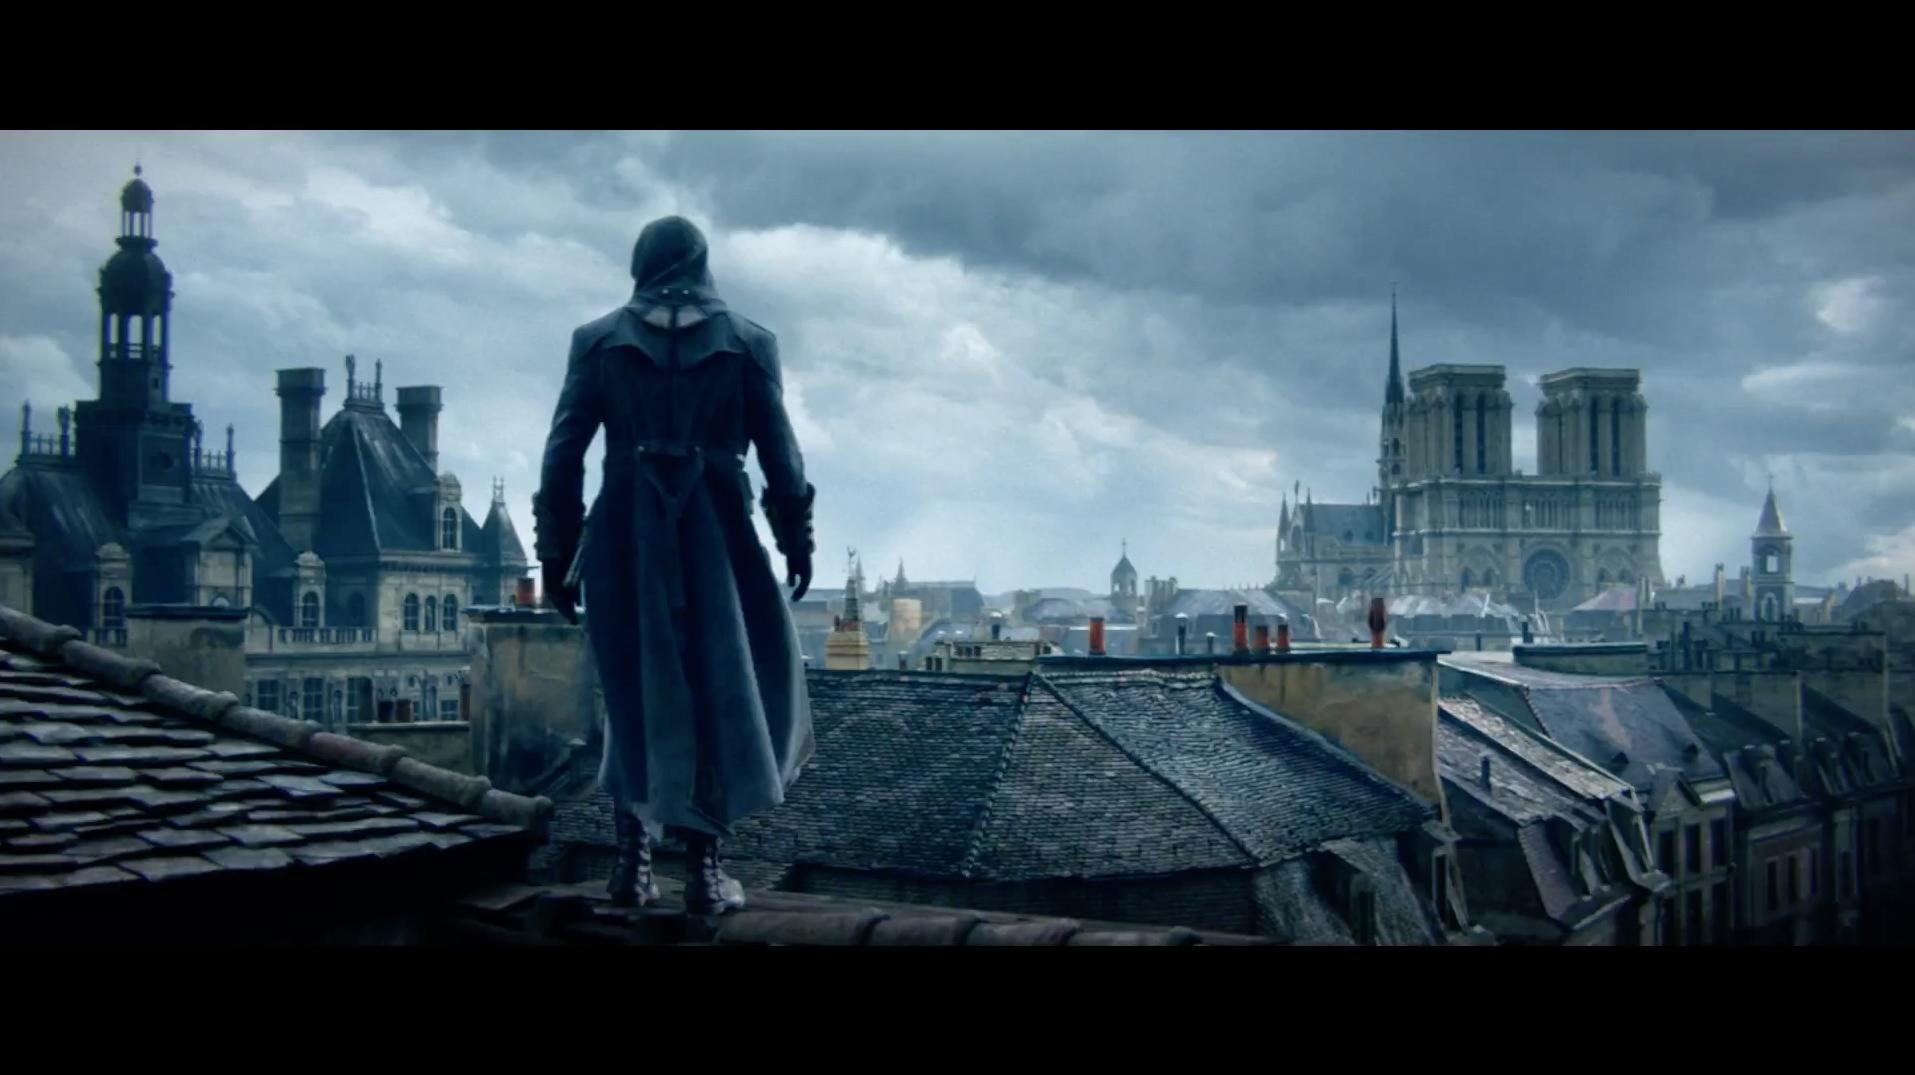 AssassinCreed4_Digic_trailer